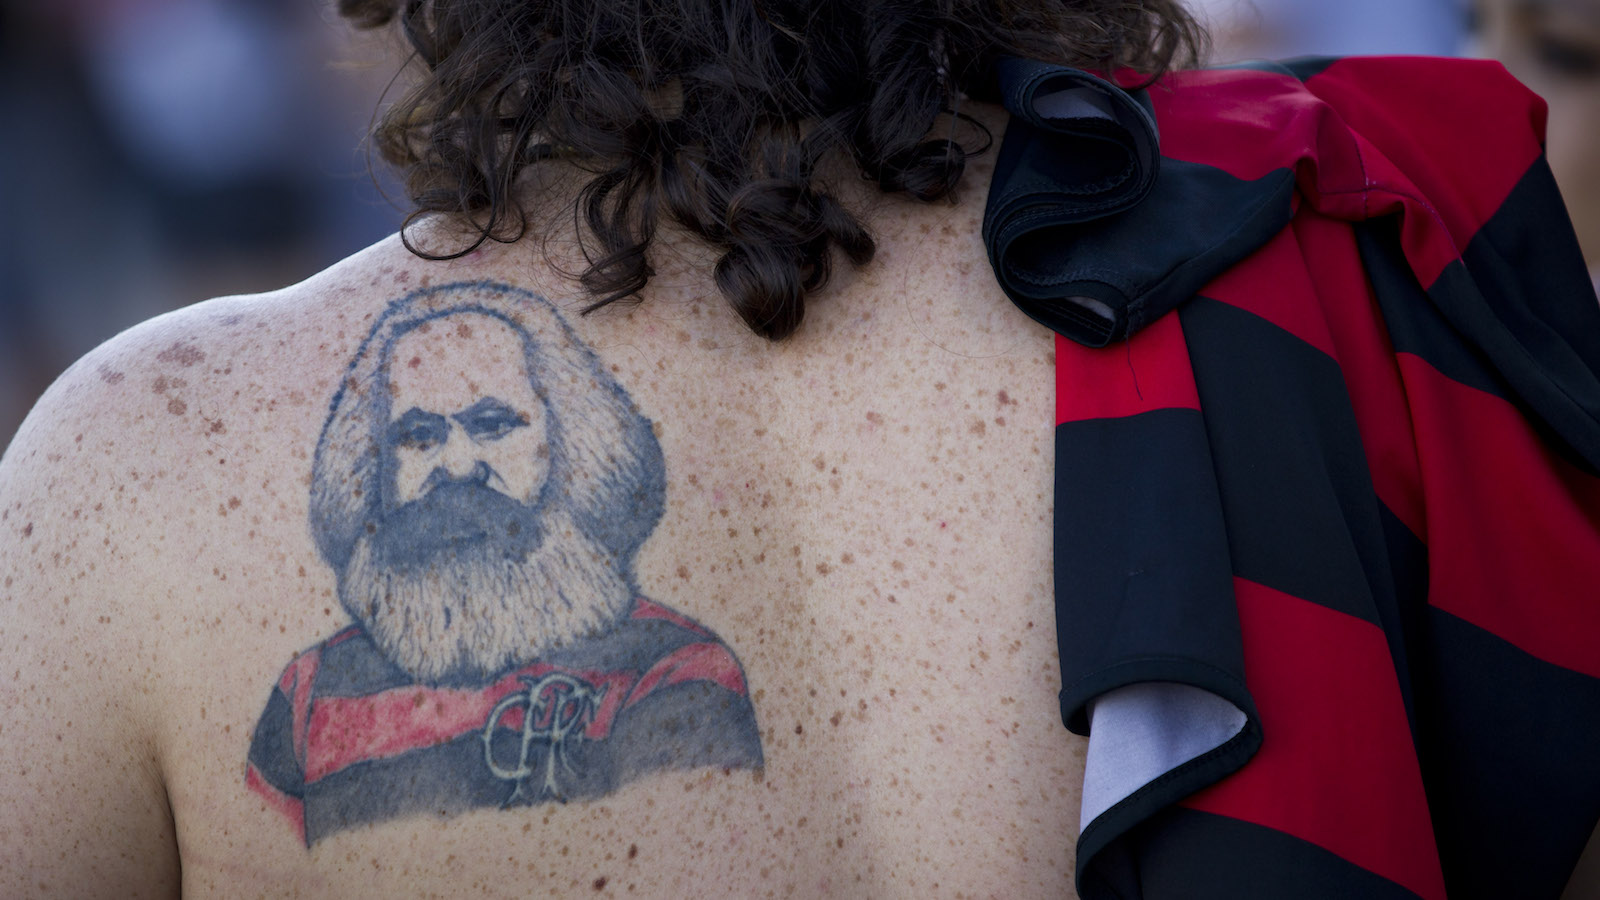 A woman with a Karl Marx tattoo